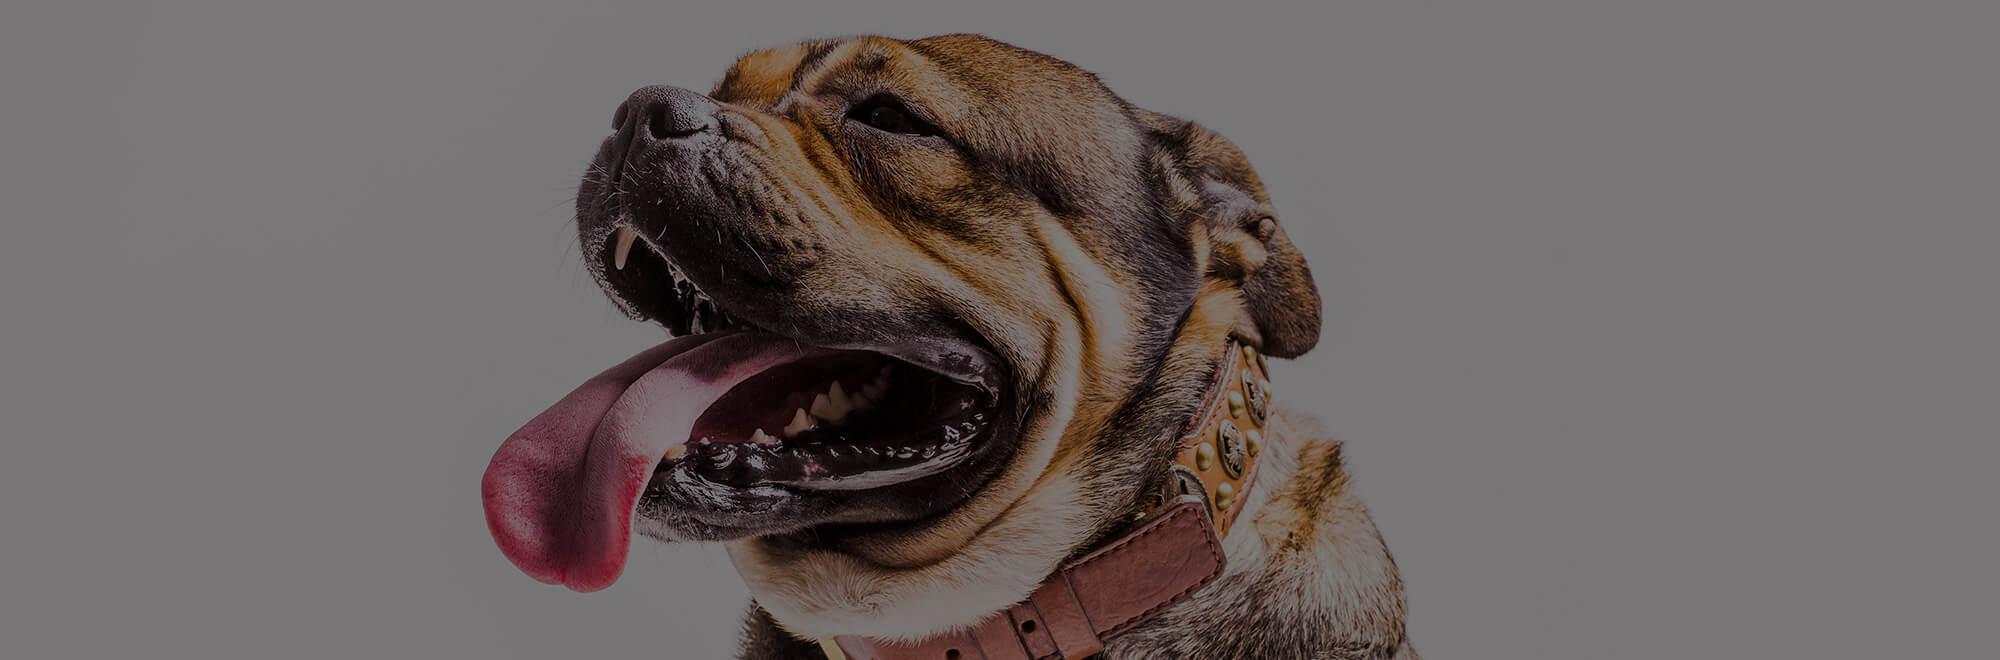 Cães podem doar sangue